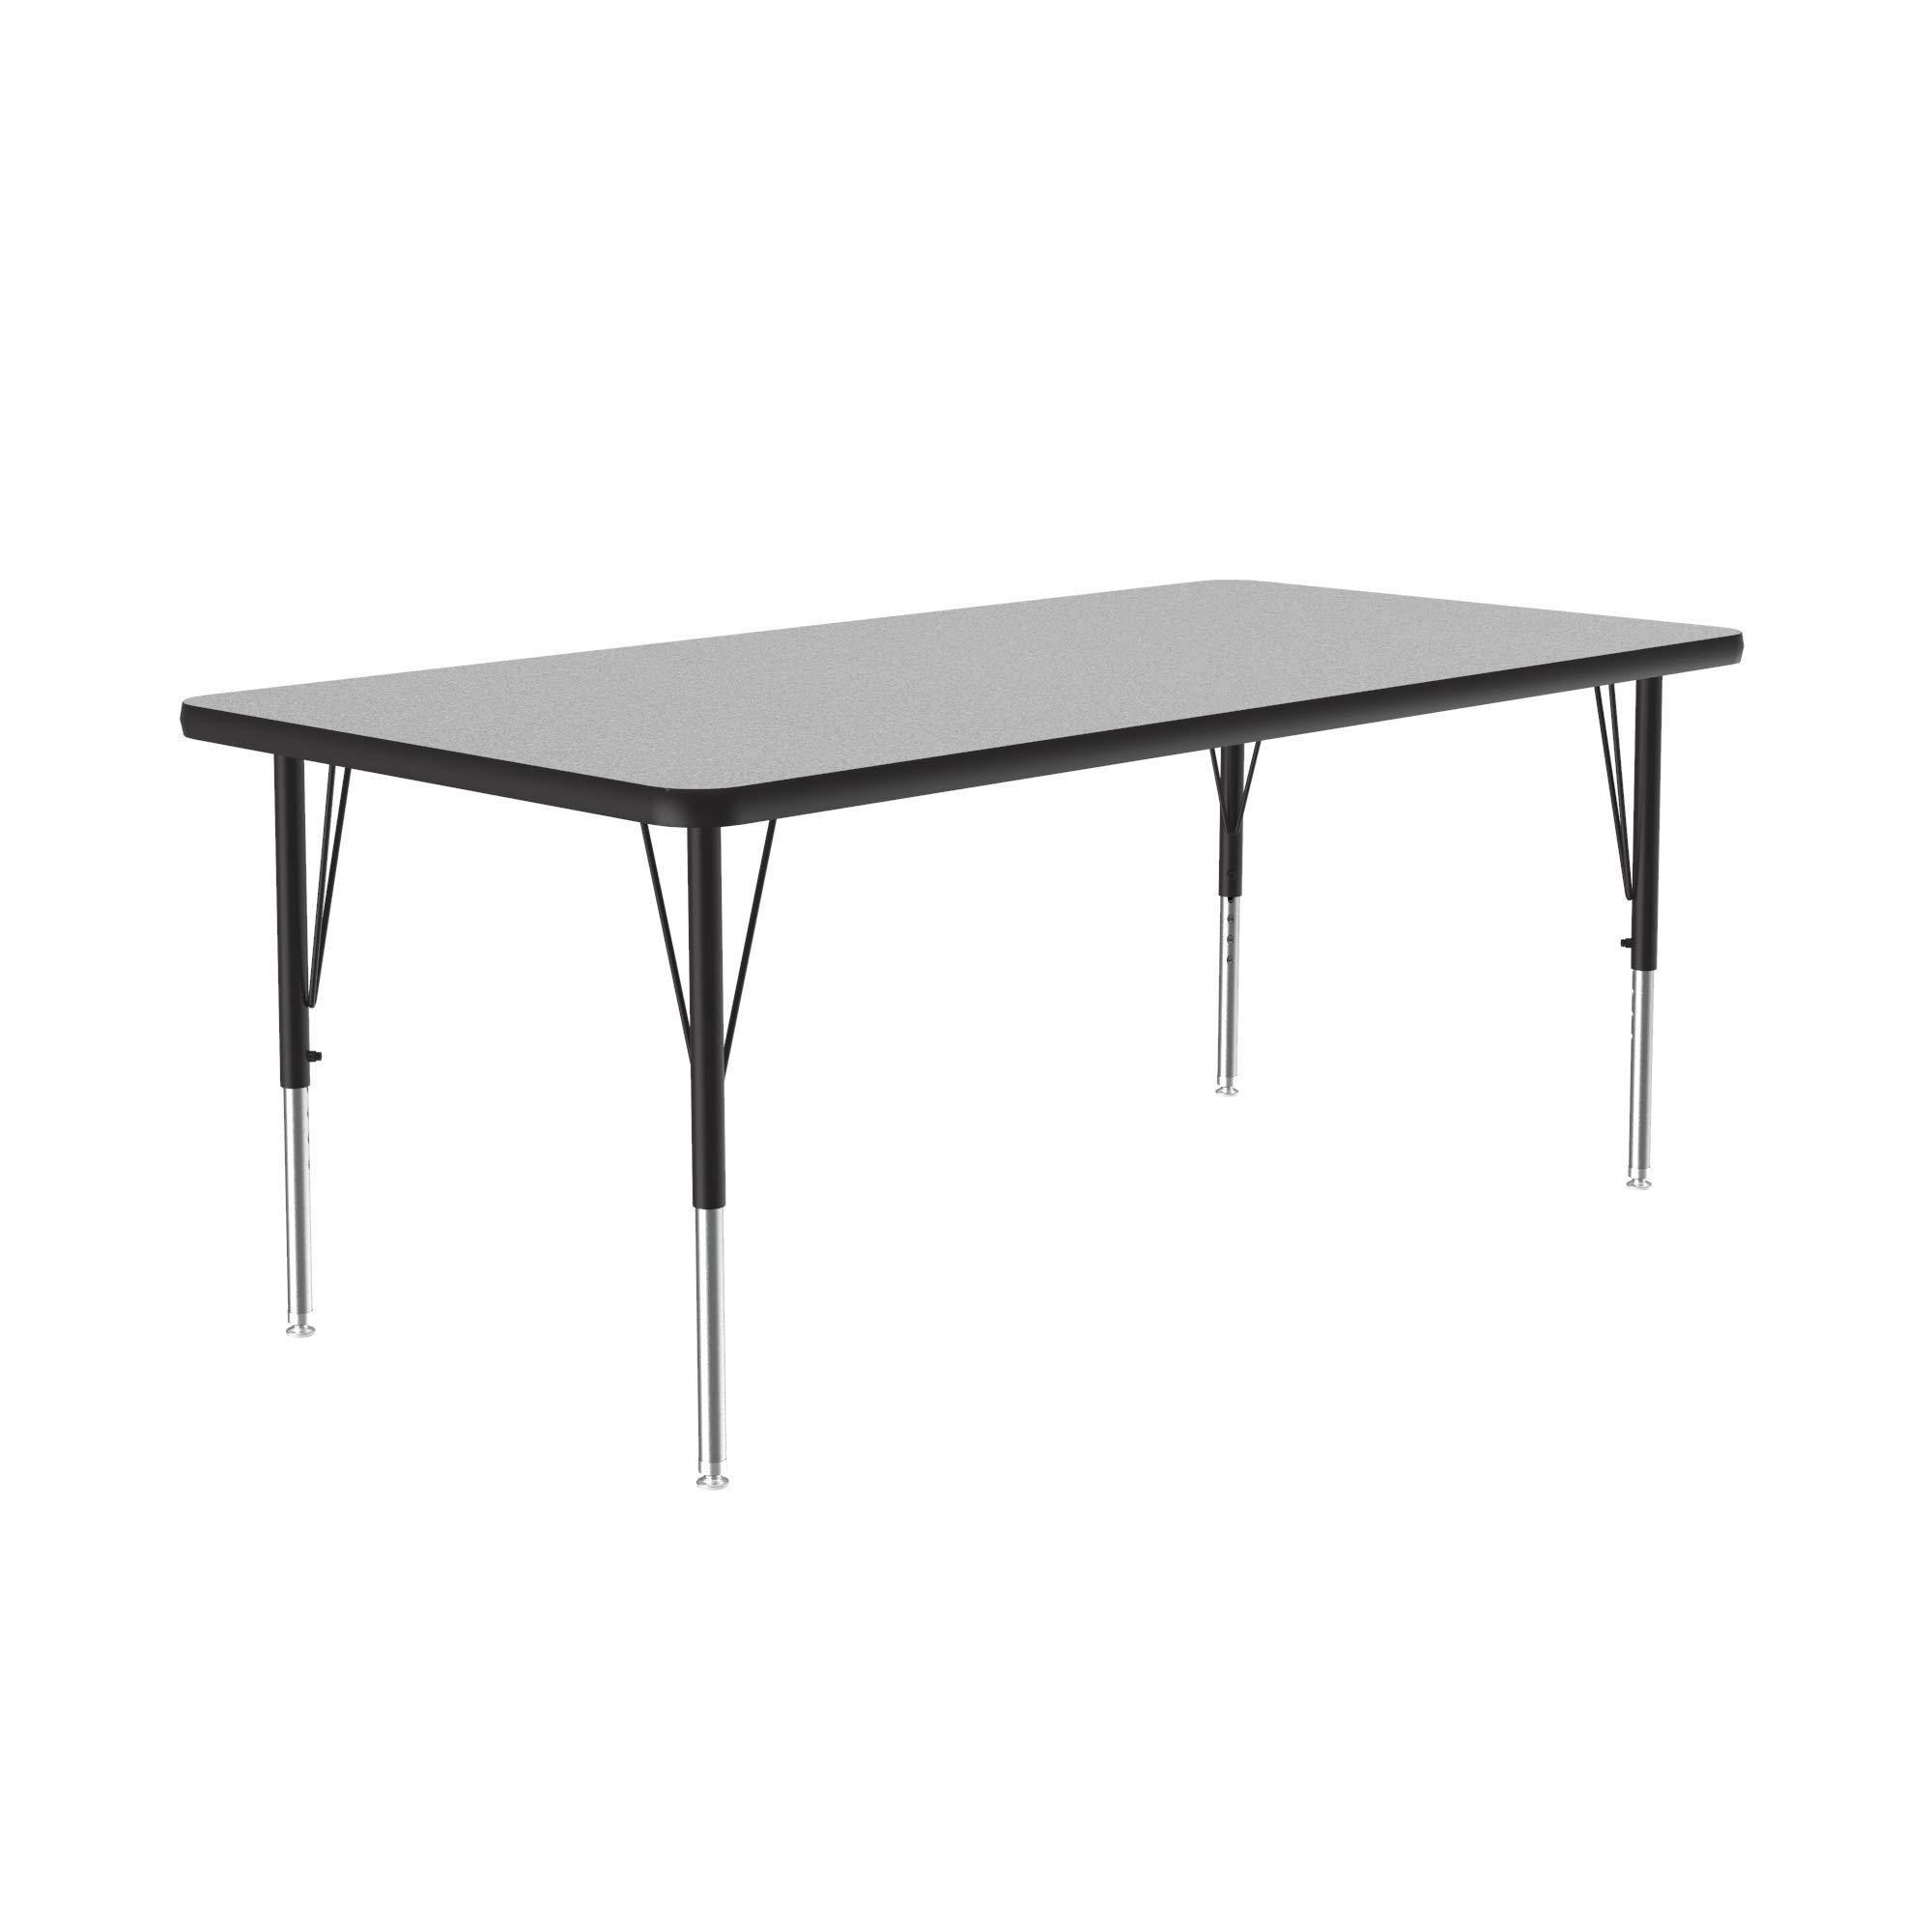 "Correll A2448-REC-15 Rectangular Activity Table, 24""x48"", Gray Granite"